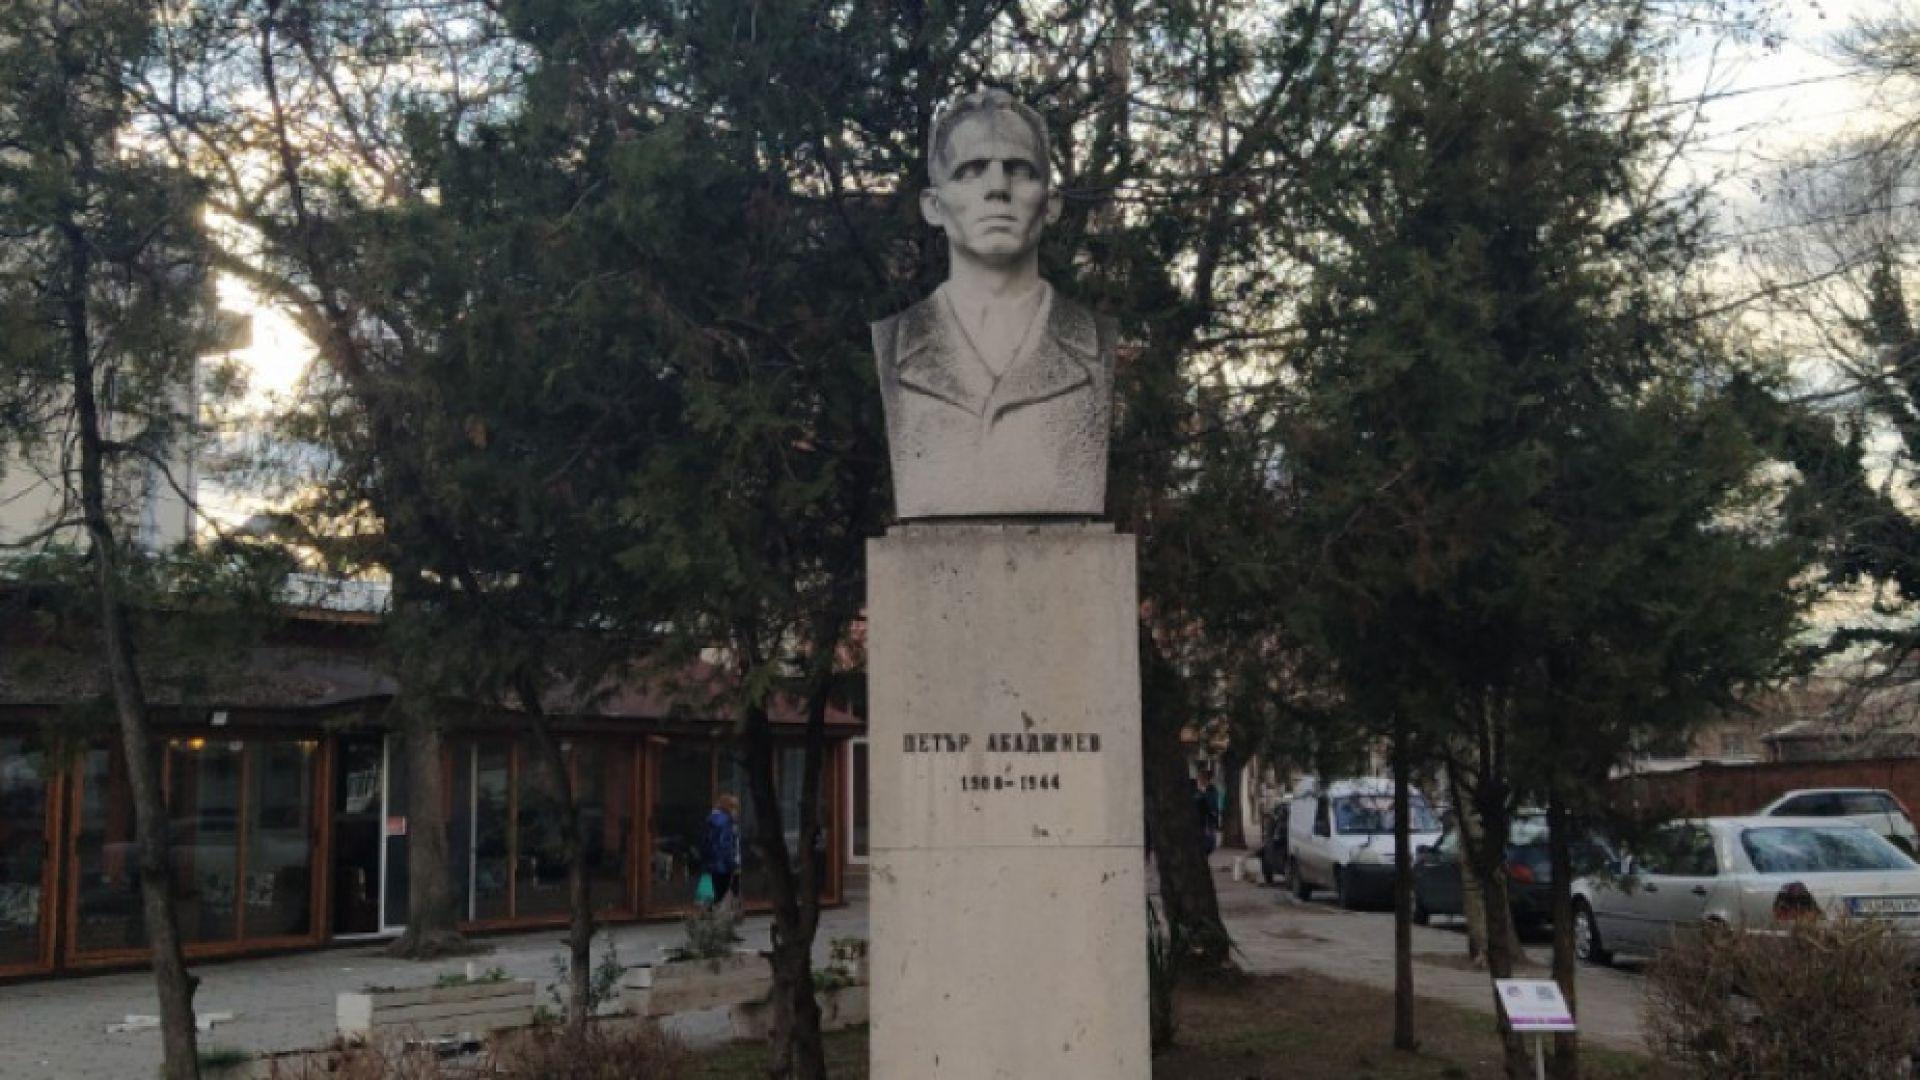 Спор за паметник в Пазарджик - терорист от 1925 г. или загинал партизанин